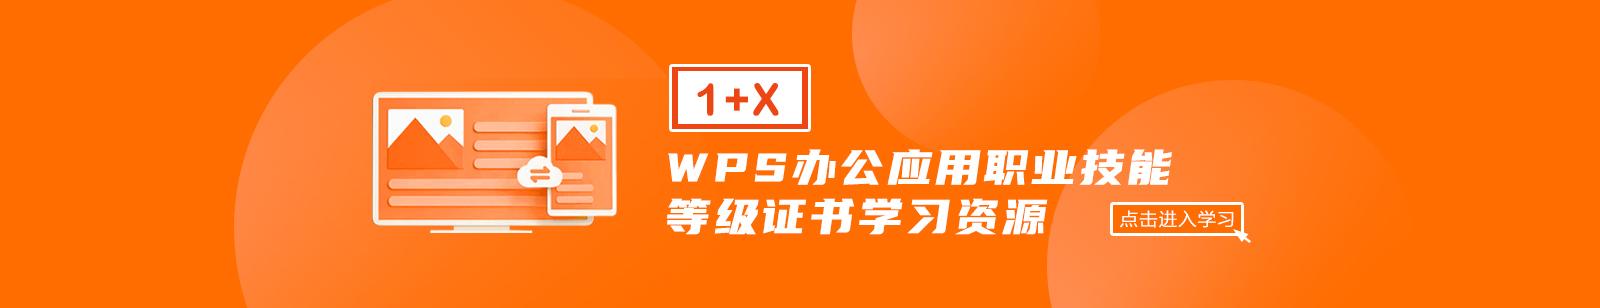 3-WPS办公应用职业技能等级证书学习资源)